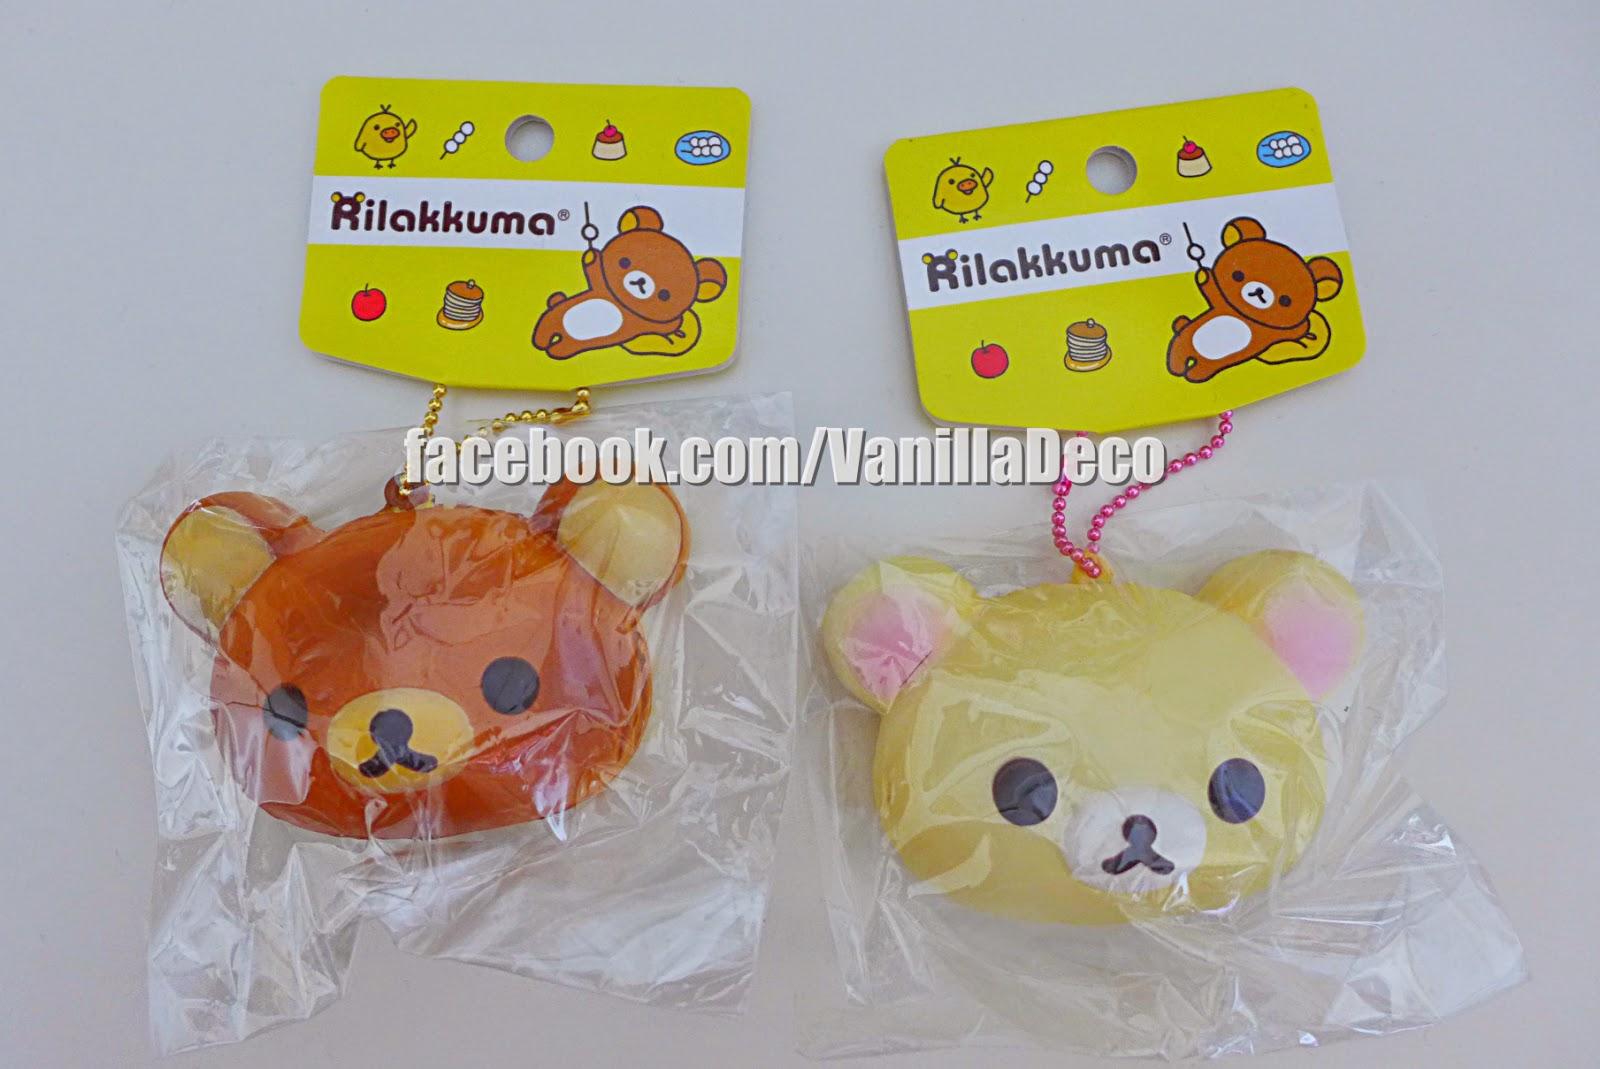 Pompompurin Squishy Bun : Sue s Cutie Closet : Squishy Update: Pom Pom Purin, Rilakkuma Bun, Aoyama Churros, Hello Kitty ...